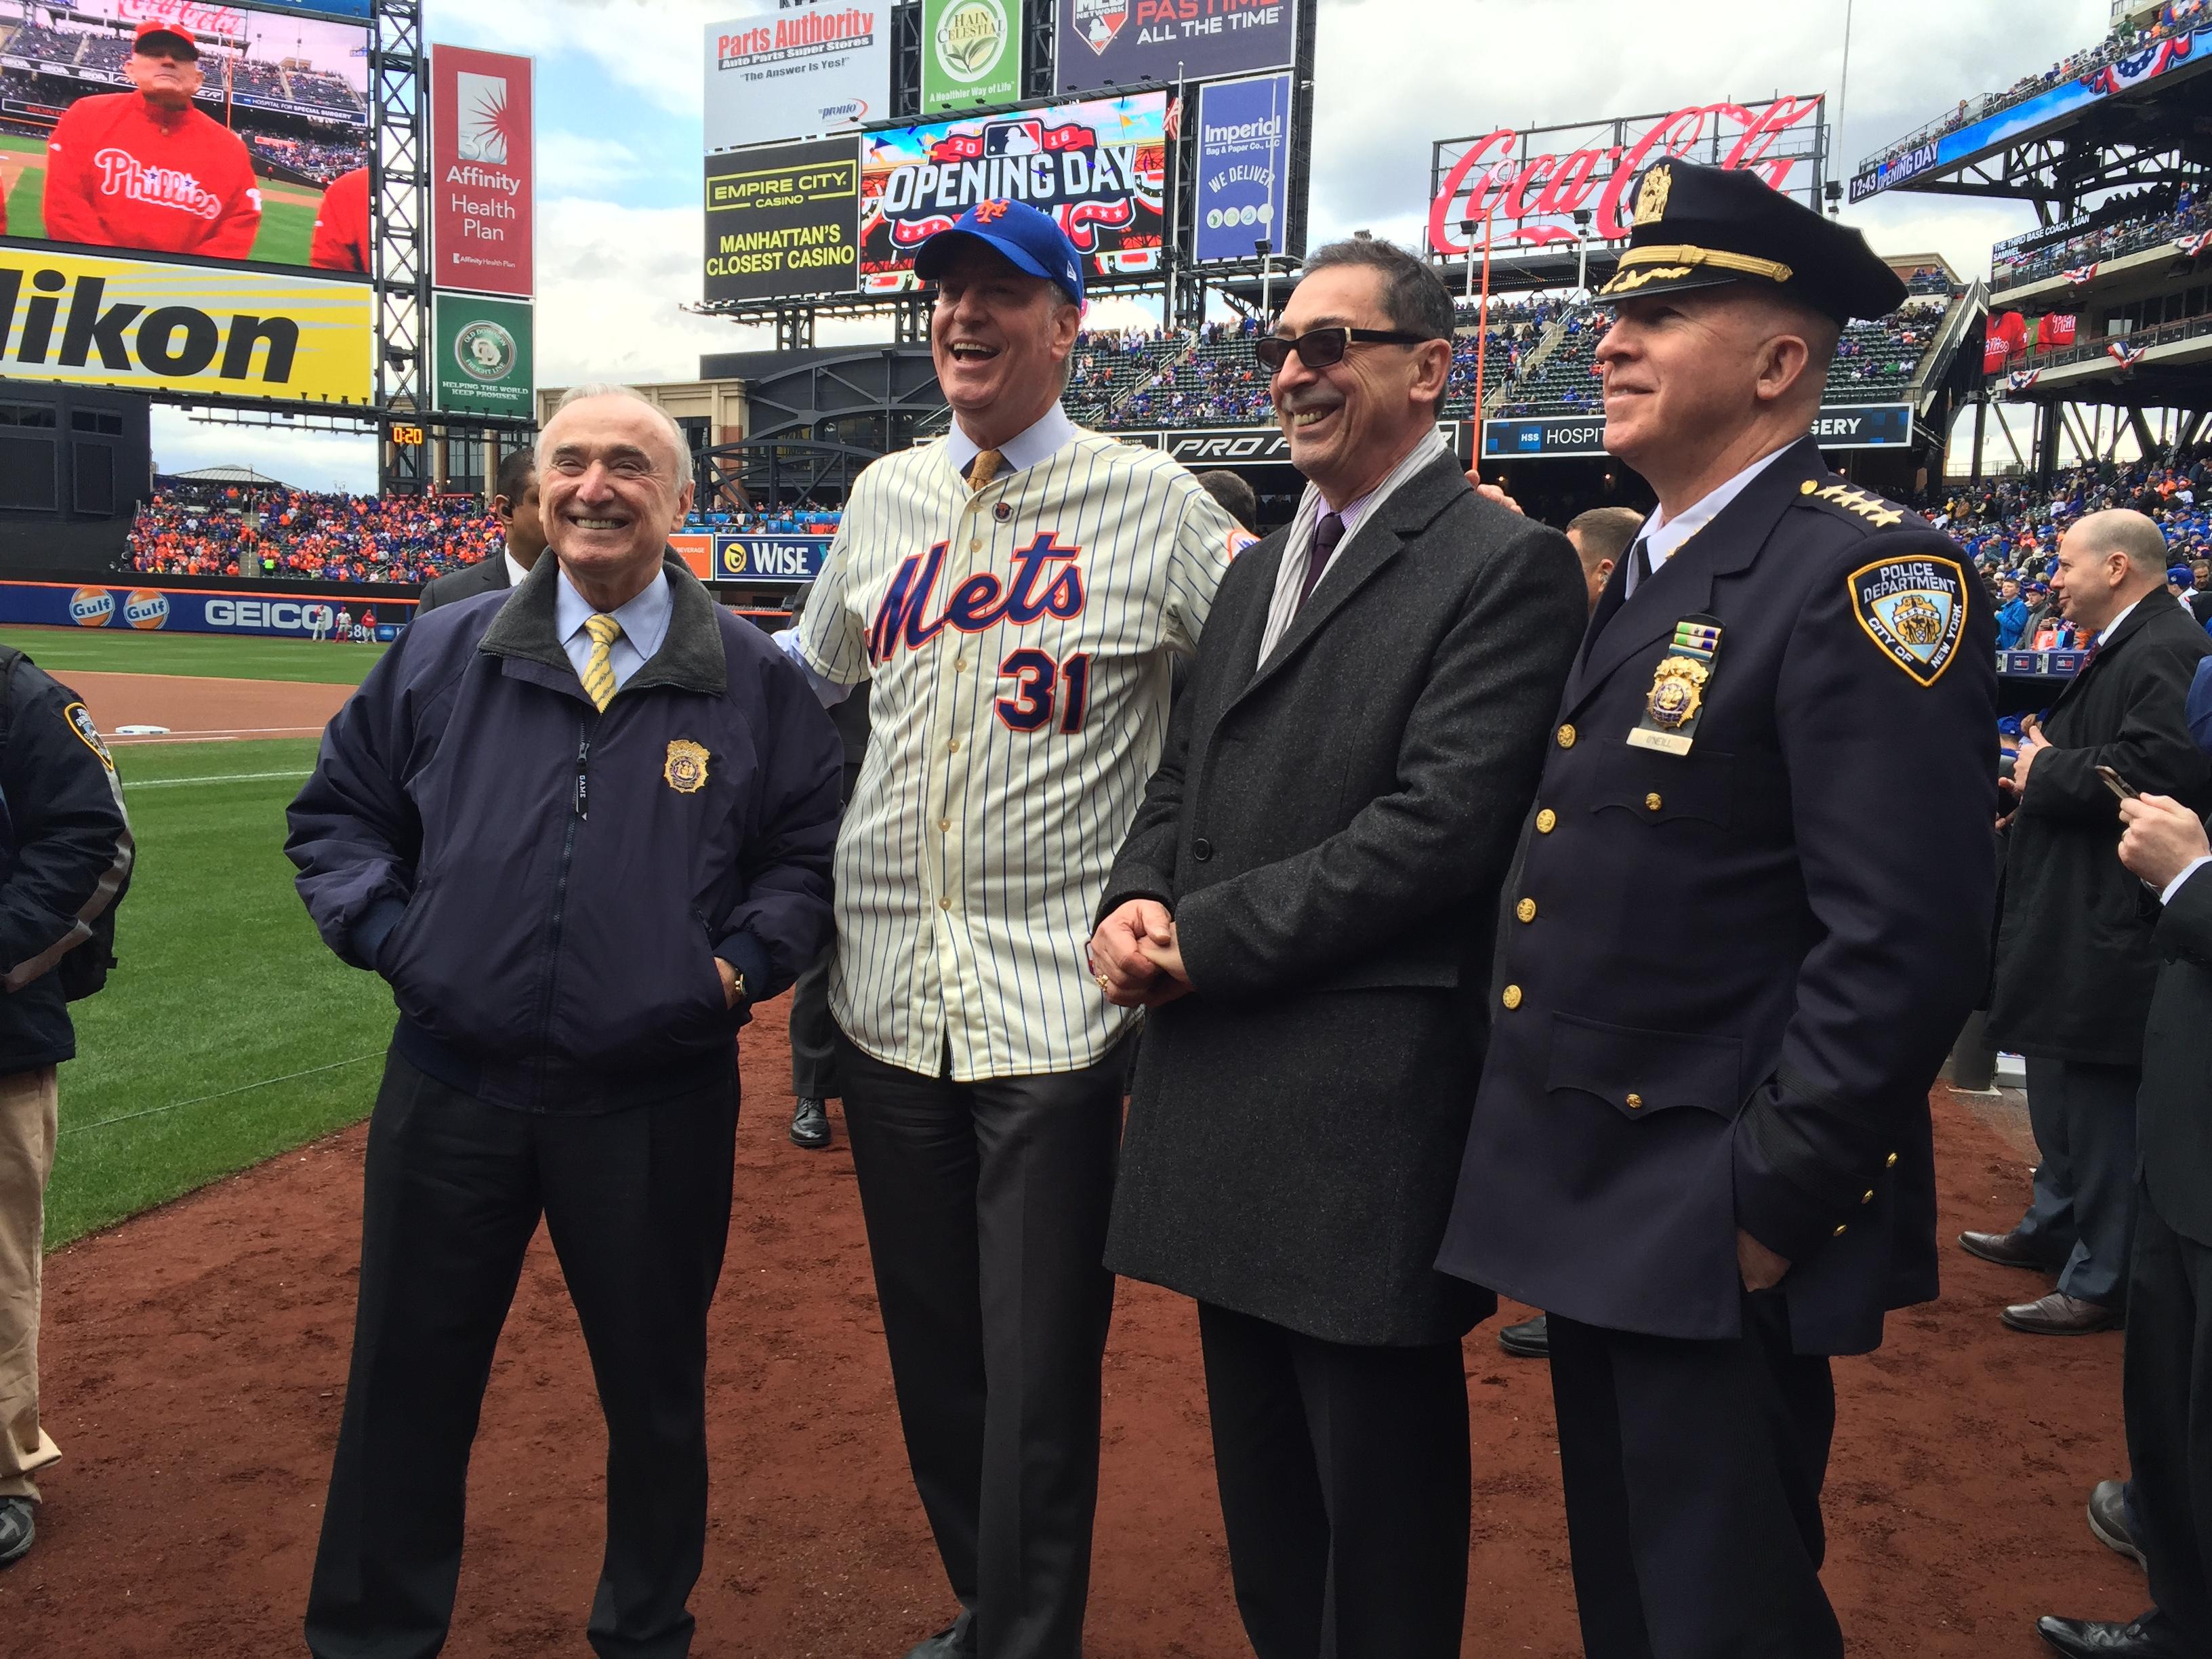 Police Commissioner Bill Bratton, Mayor Bill de Blasio, Fire Commissioner Daniel Nigro, and Chief of Department James O'Neill.